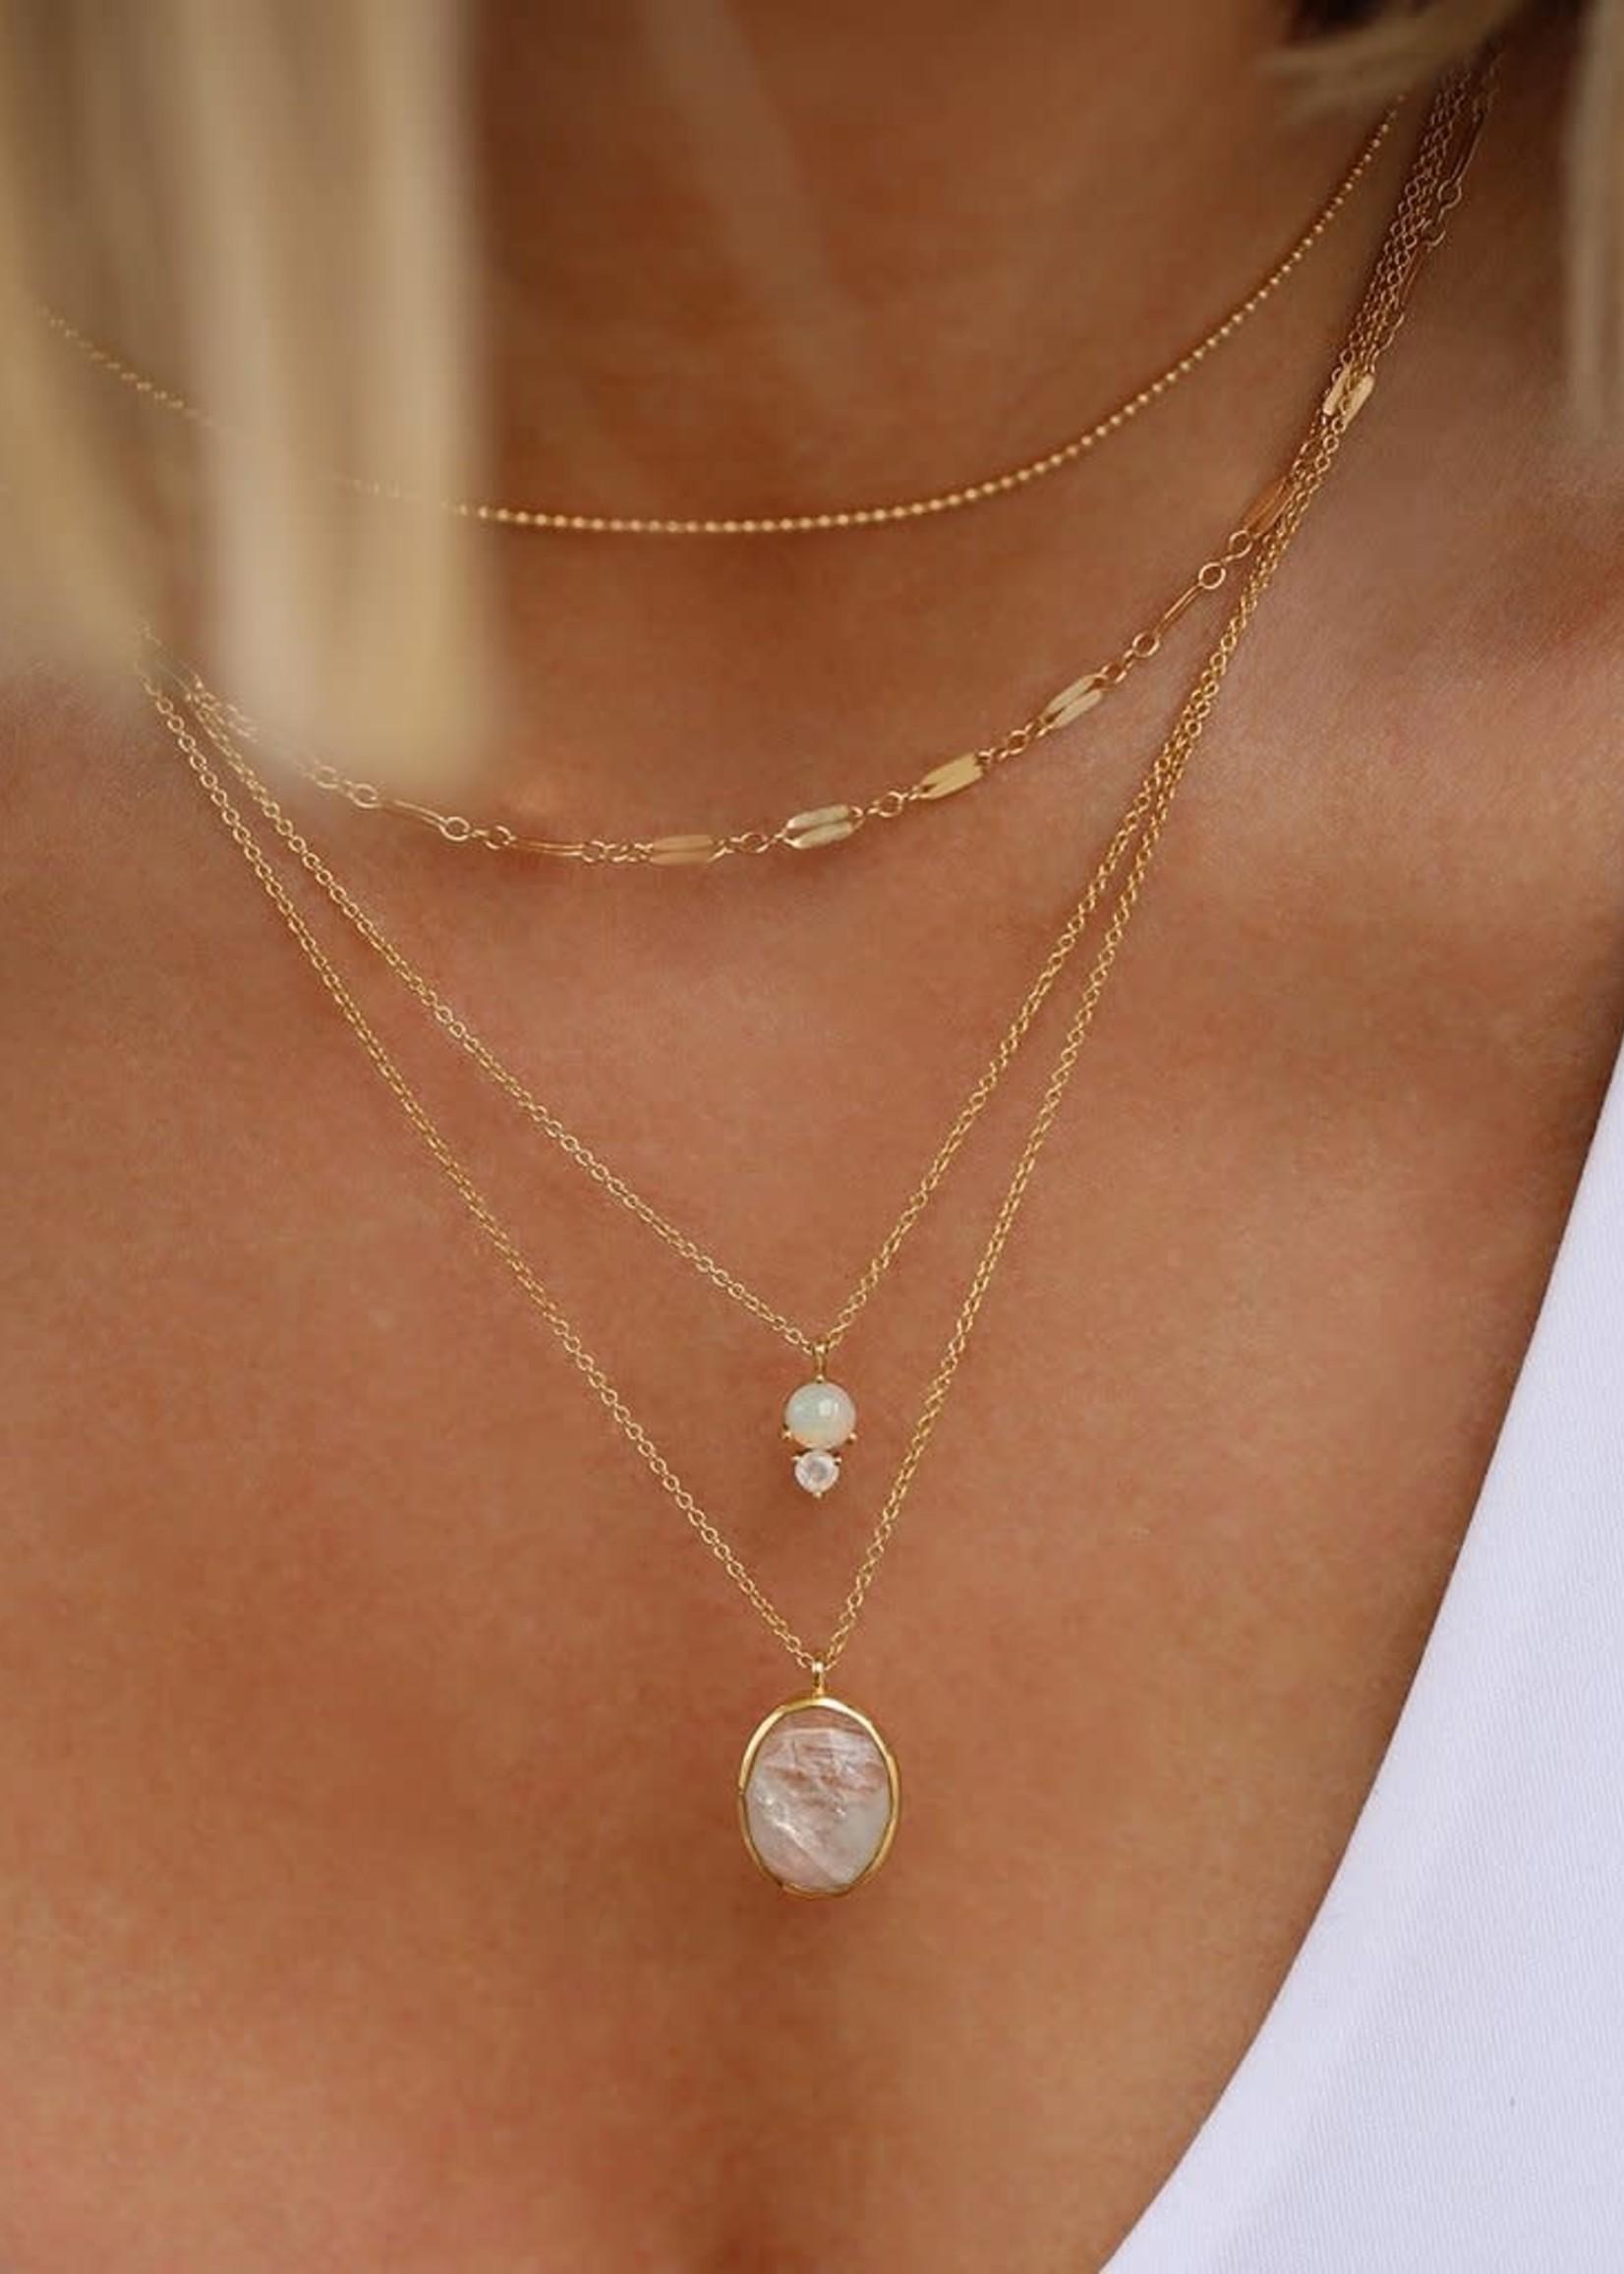 LEAH ALEXANDRA MARA necklace